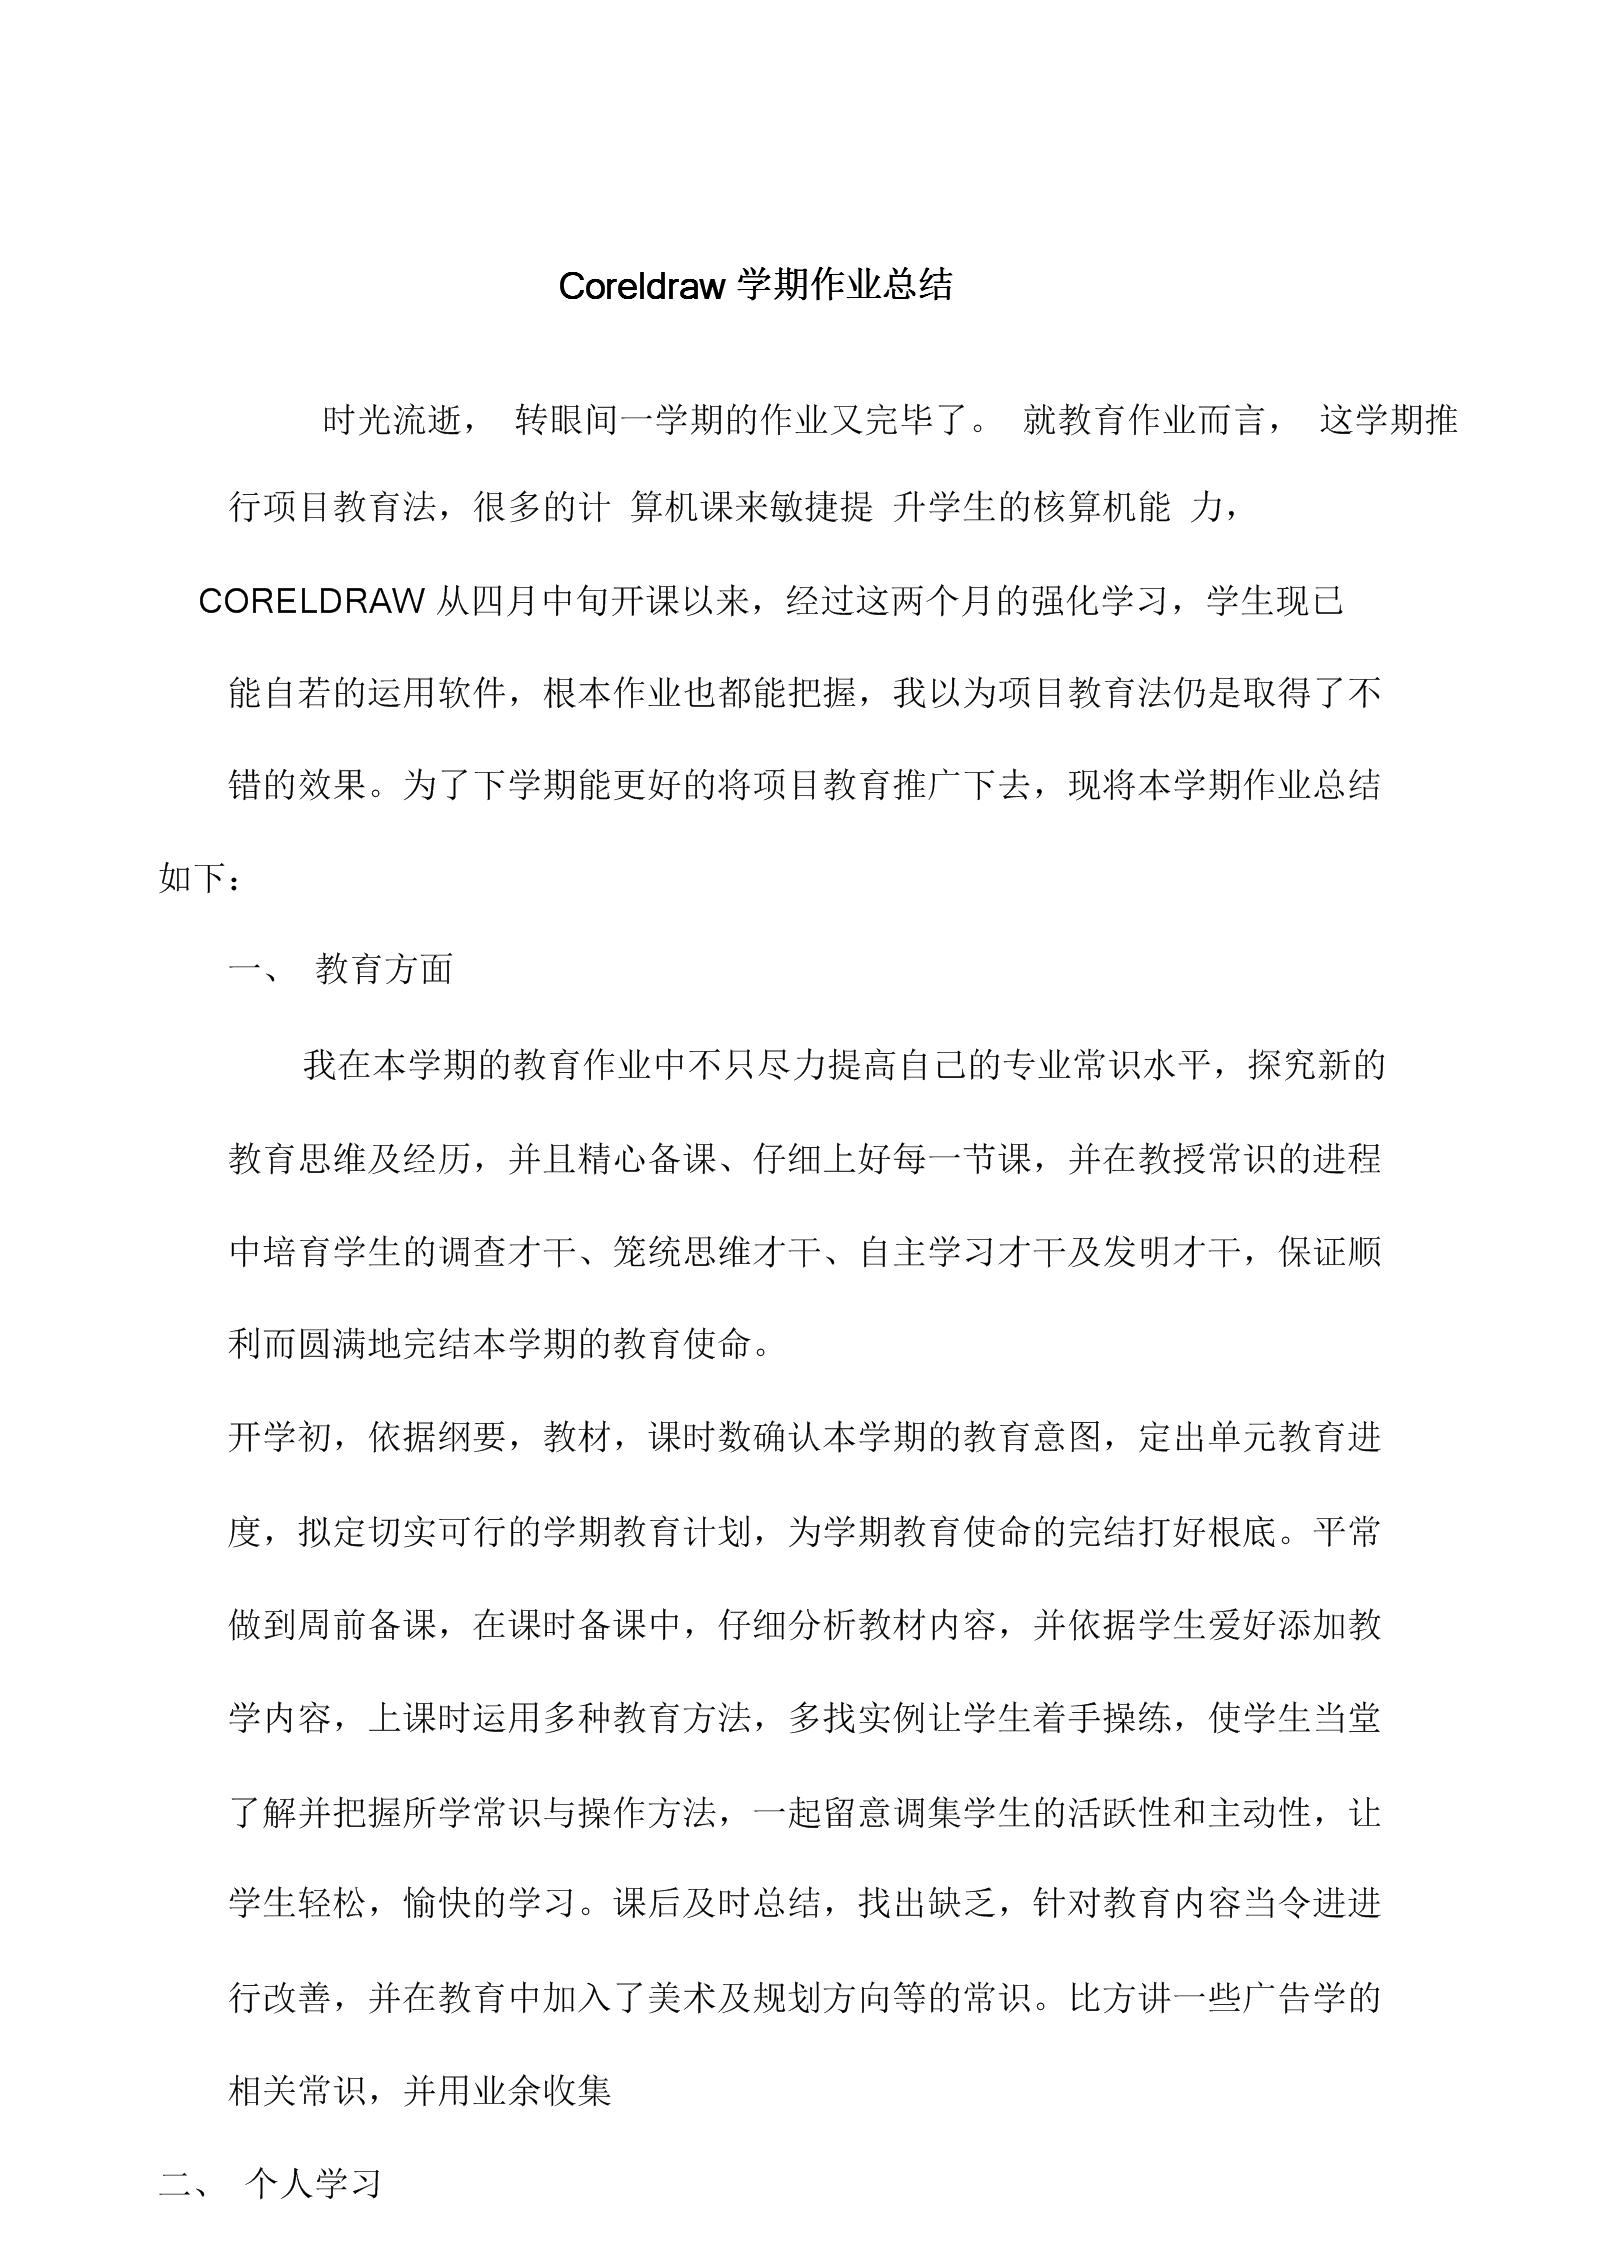 Coreldraw学期工作总结报告.doc